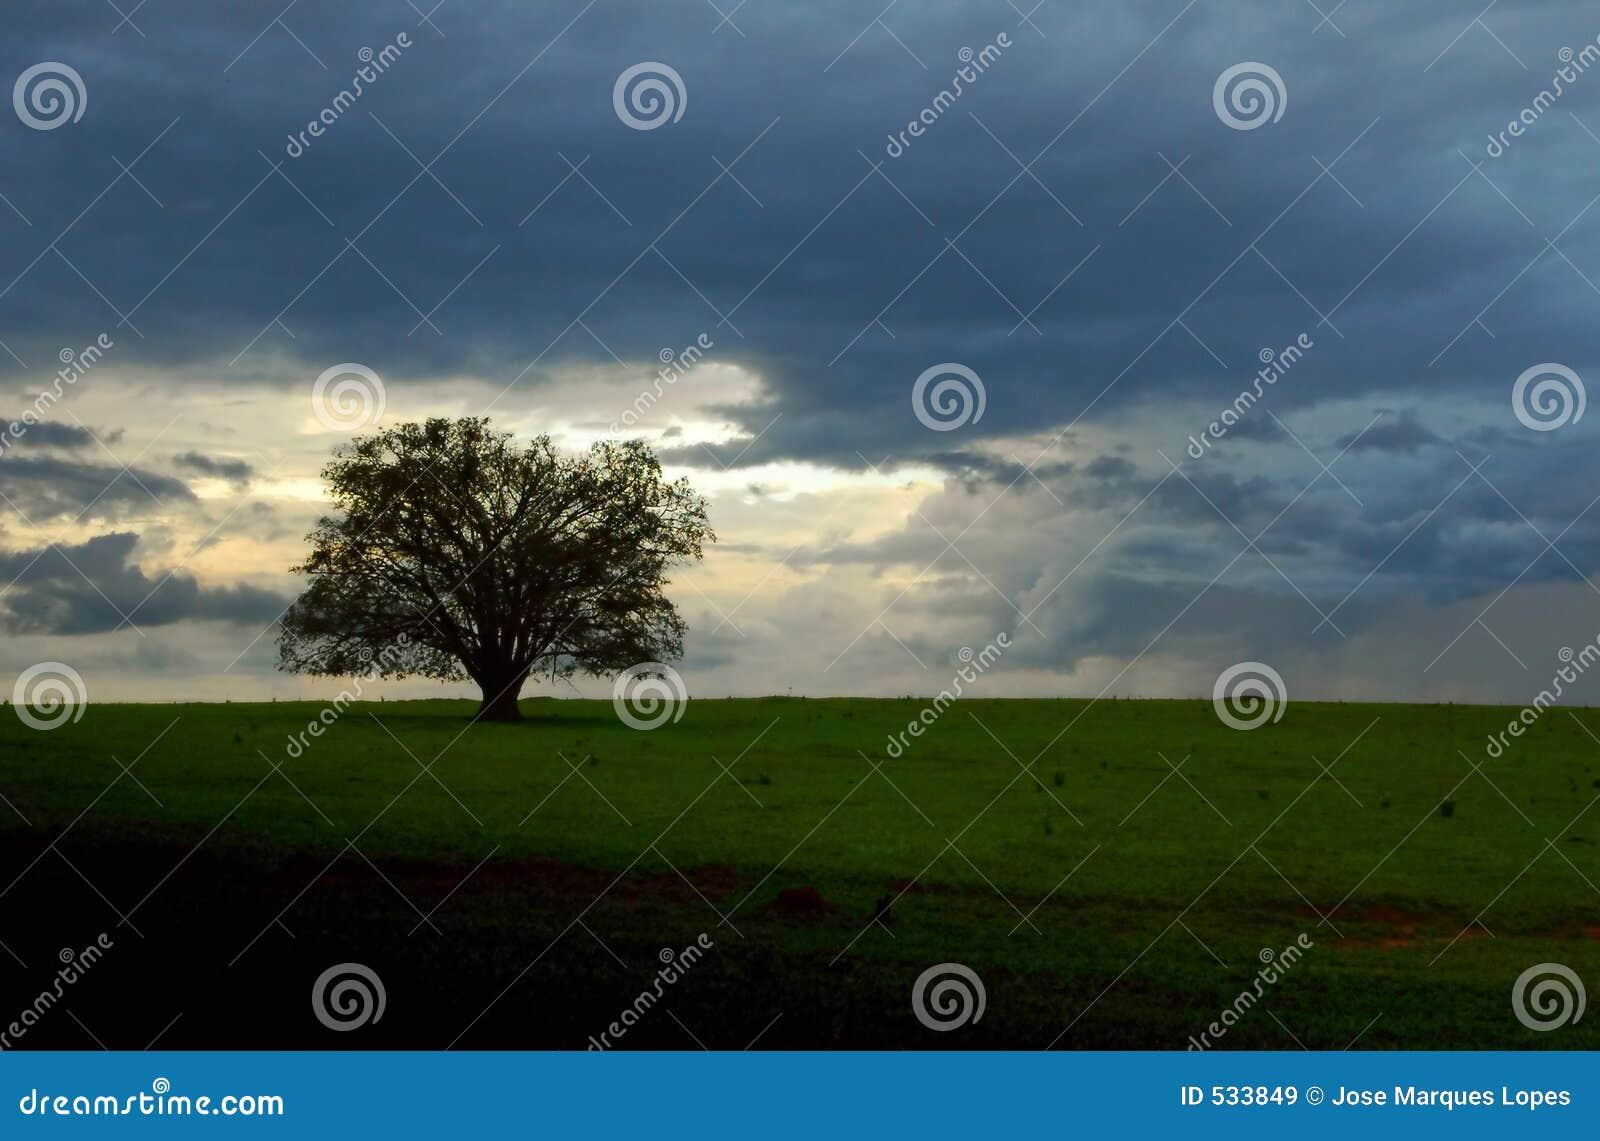 Download 覆盖结构树 库存图片. 图片 包括有 结构树, 日落, 云彩, 墙纸, 农场, 工厂, 横向, 本质 - 533849